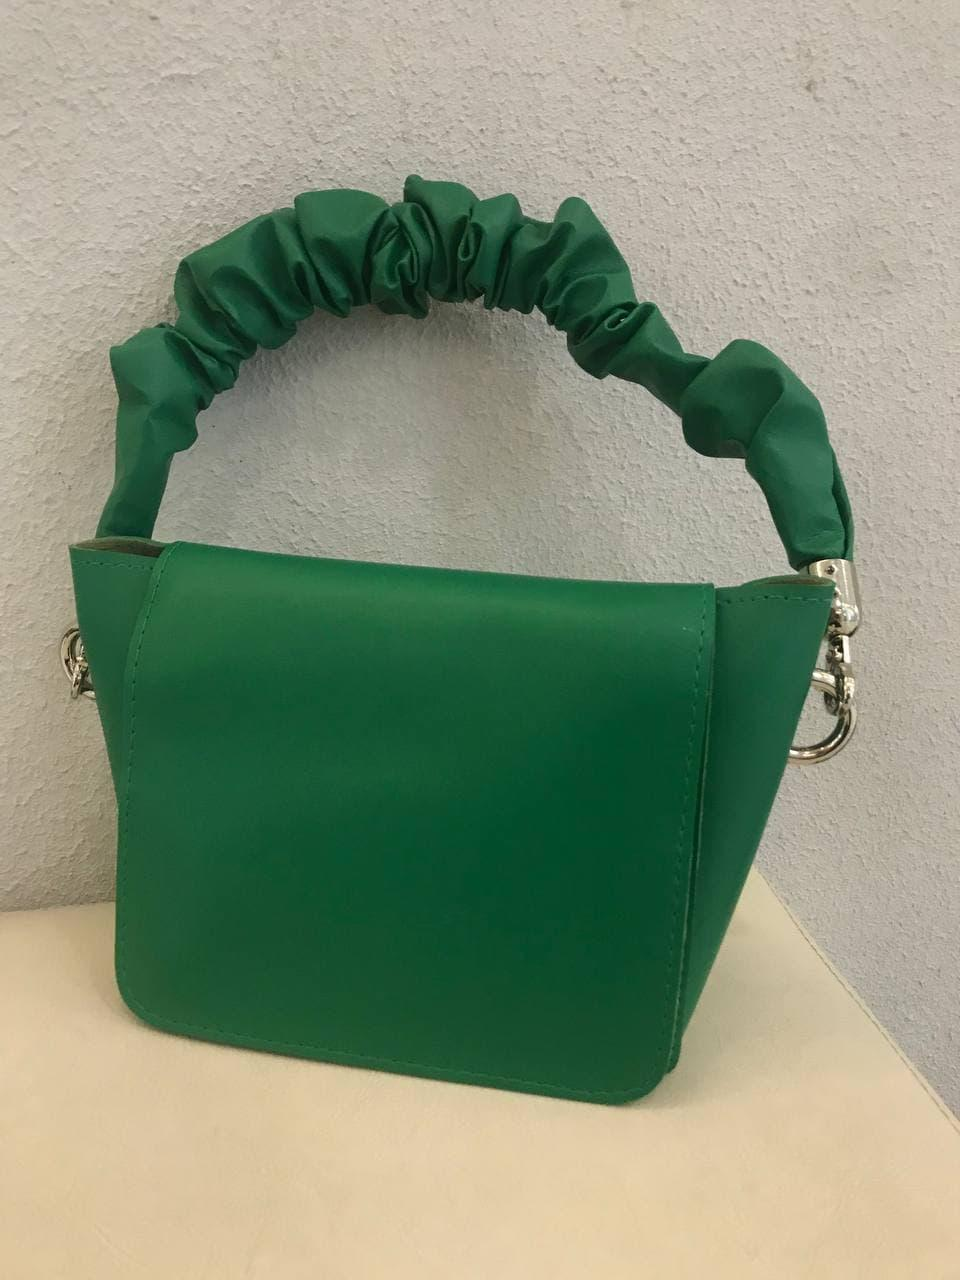 Сумка жіноча зелена маленька з еко-шкіри Modna Kazka MK21-32